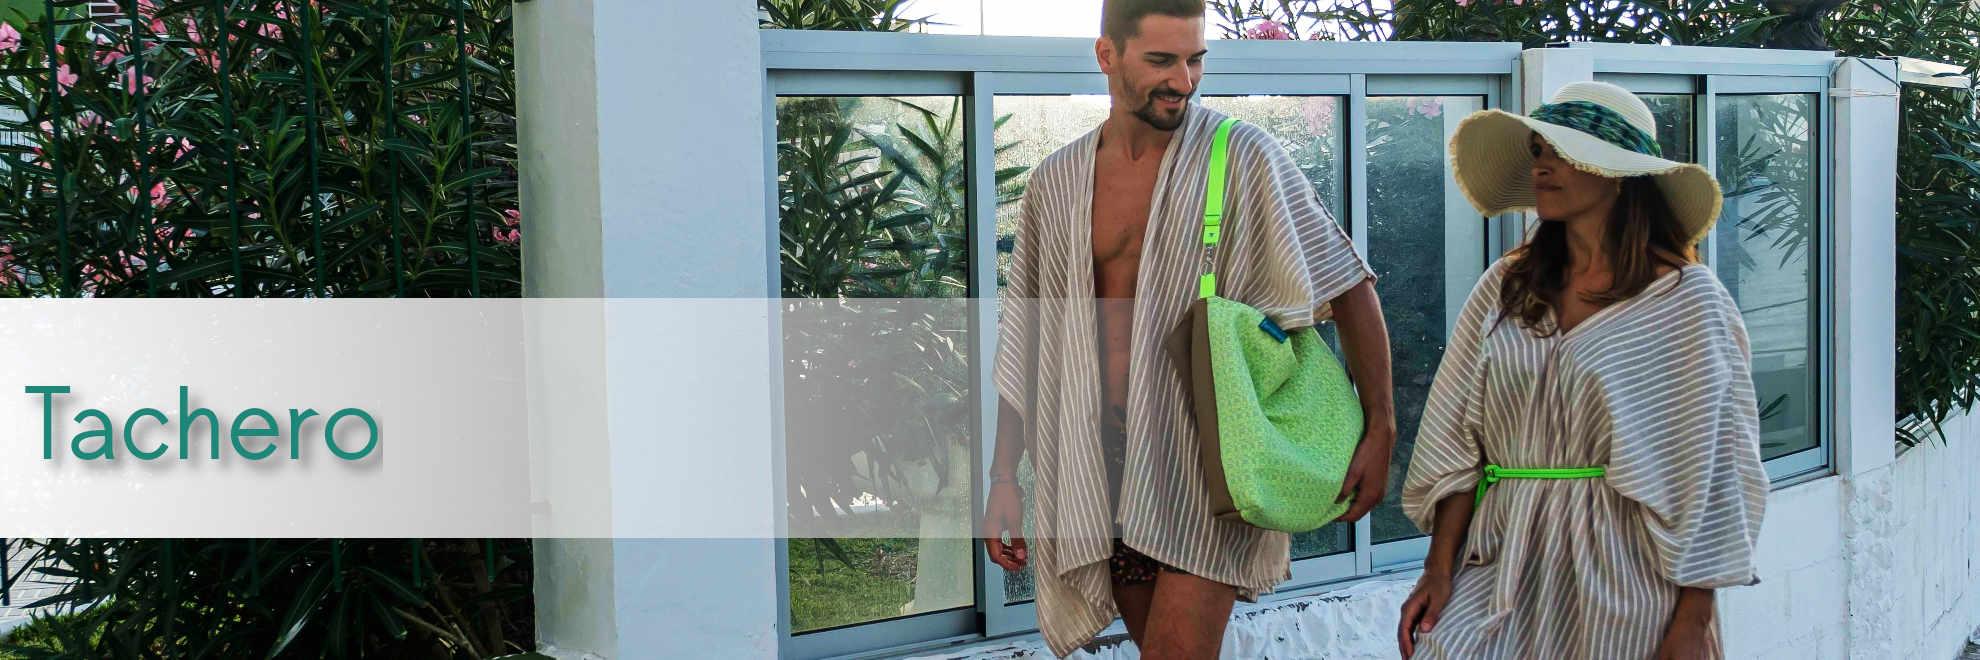 Modelos con bolsos de tela de la serie Tachero de Farobag